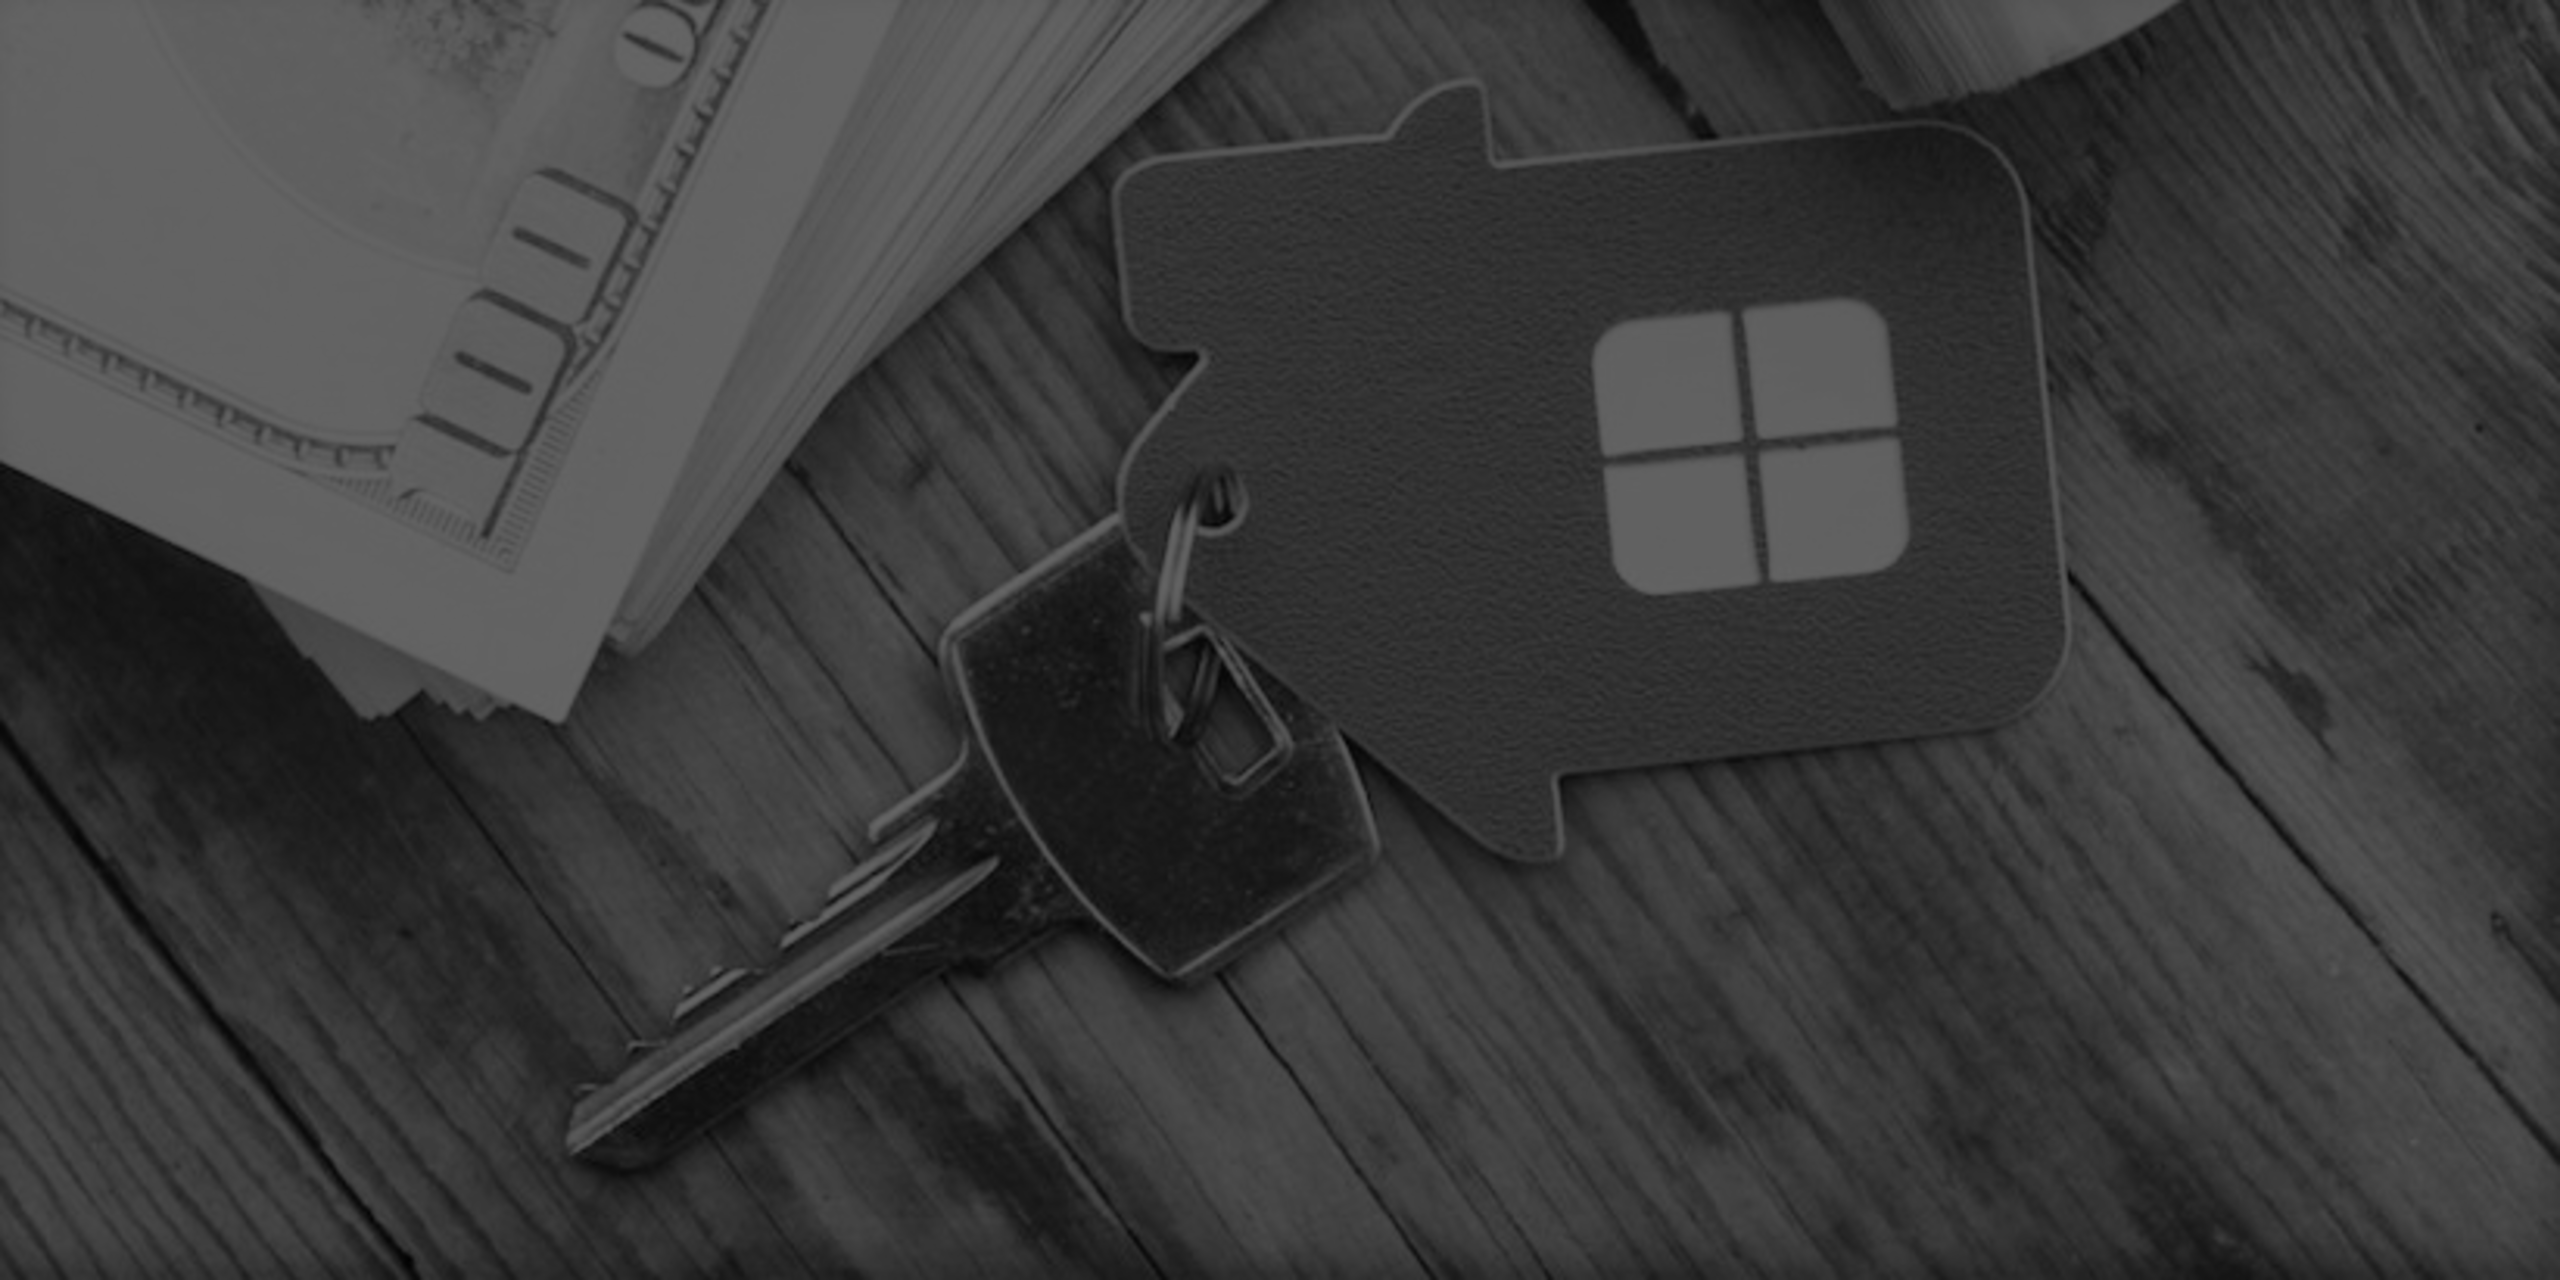 Poor credit scores keep Gen Xers from entering the housing market